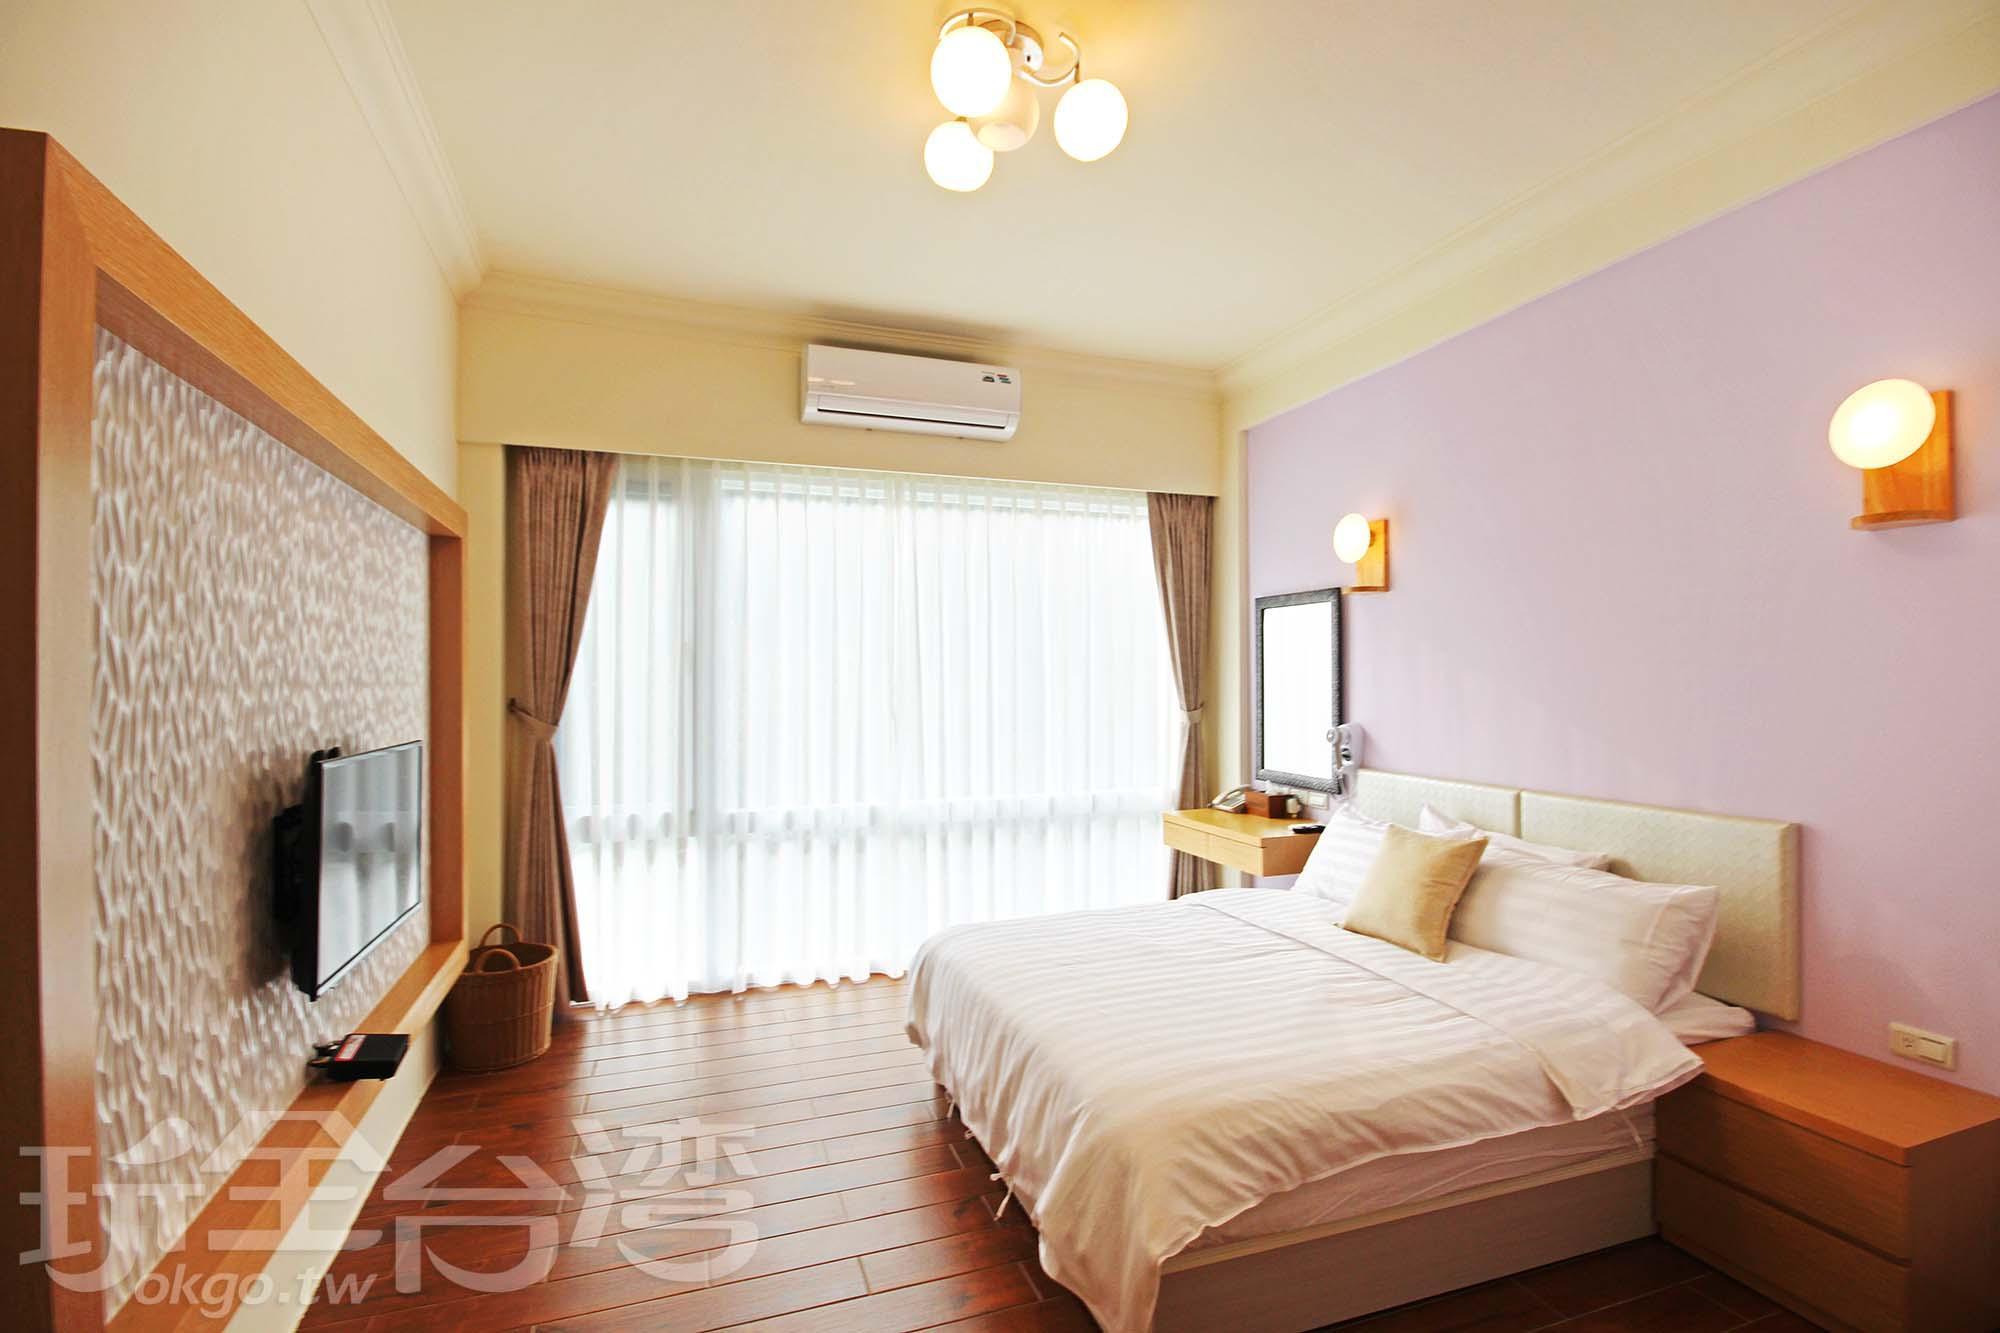 Songhe ShanShuei BandB Hotel 202